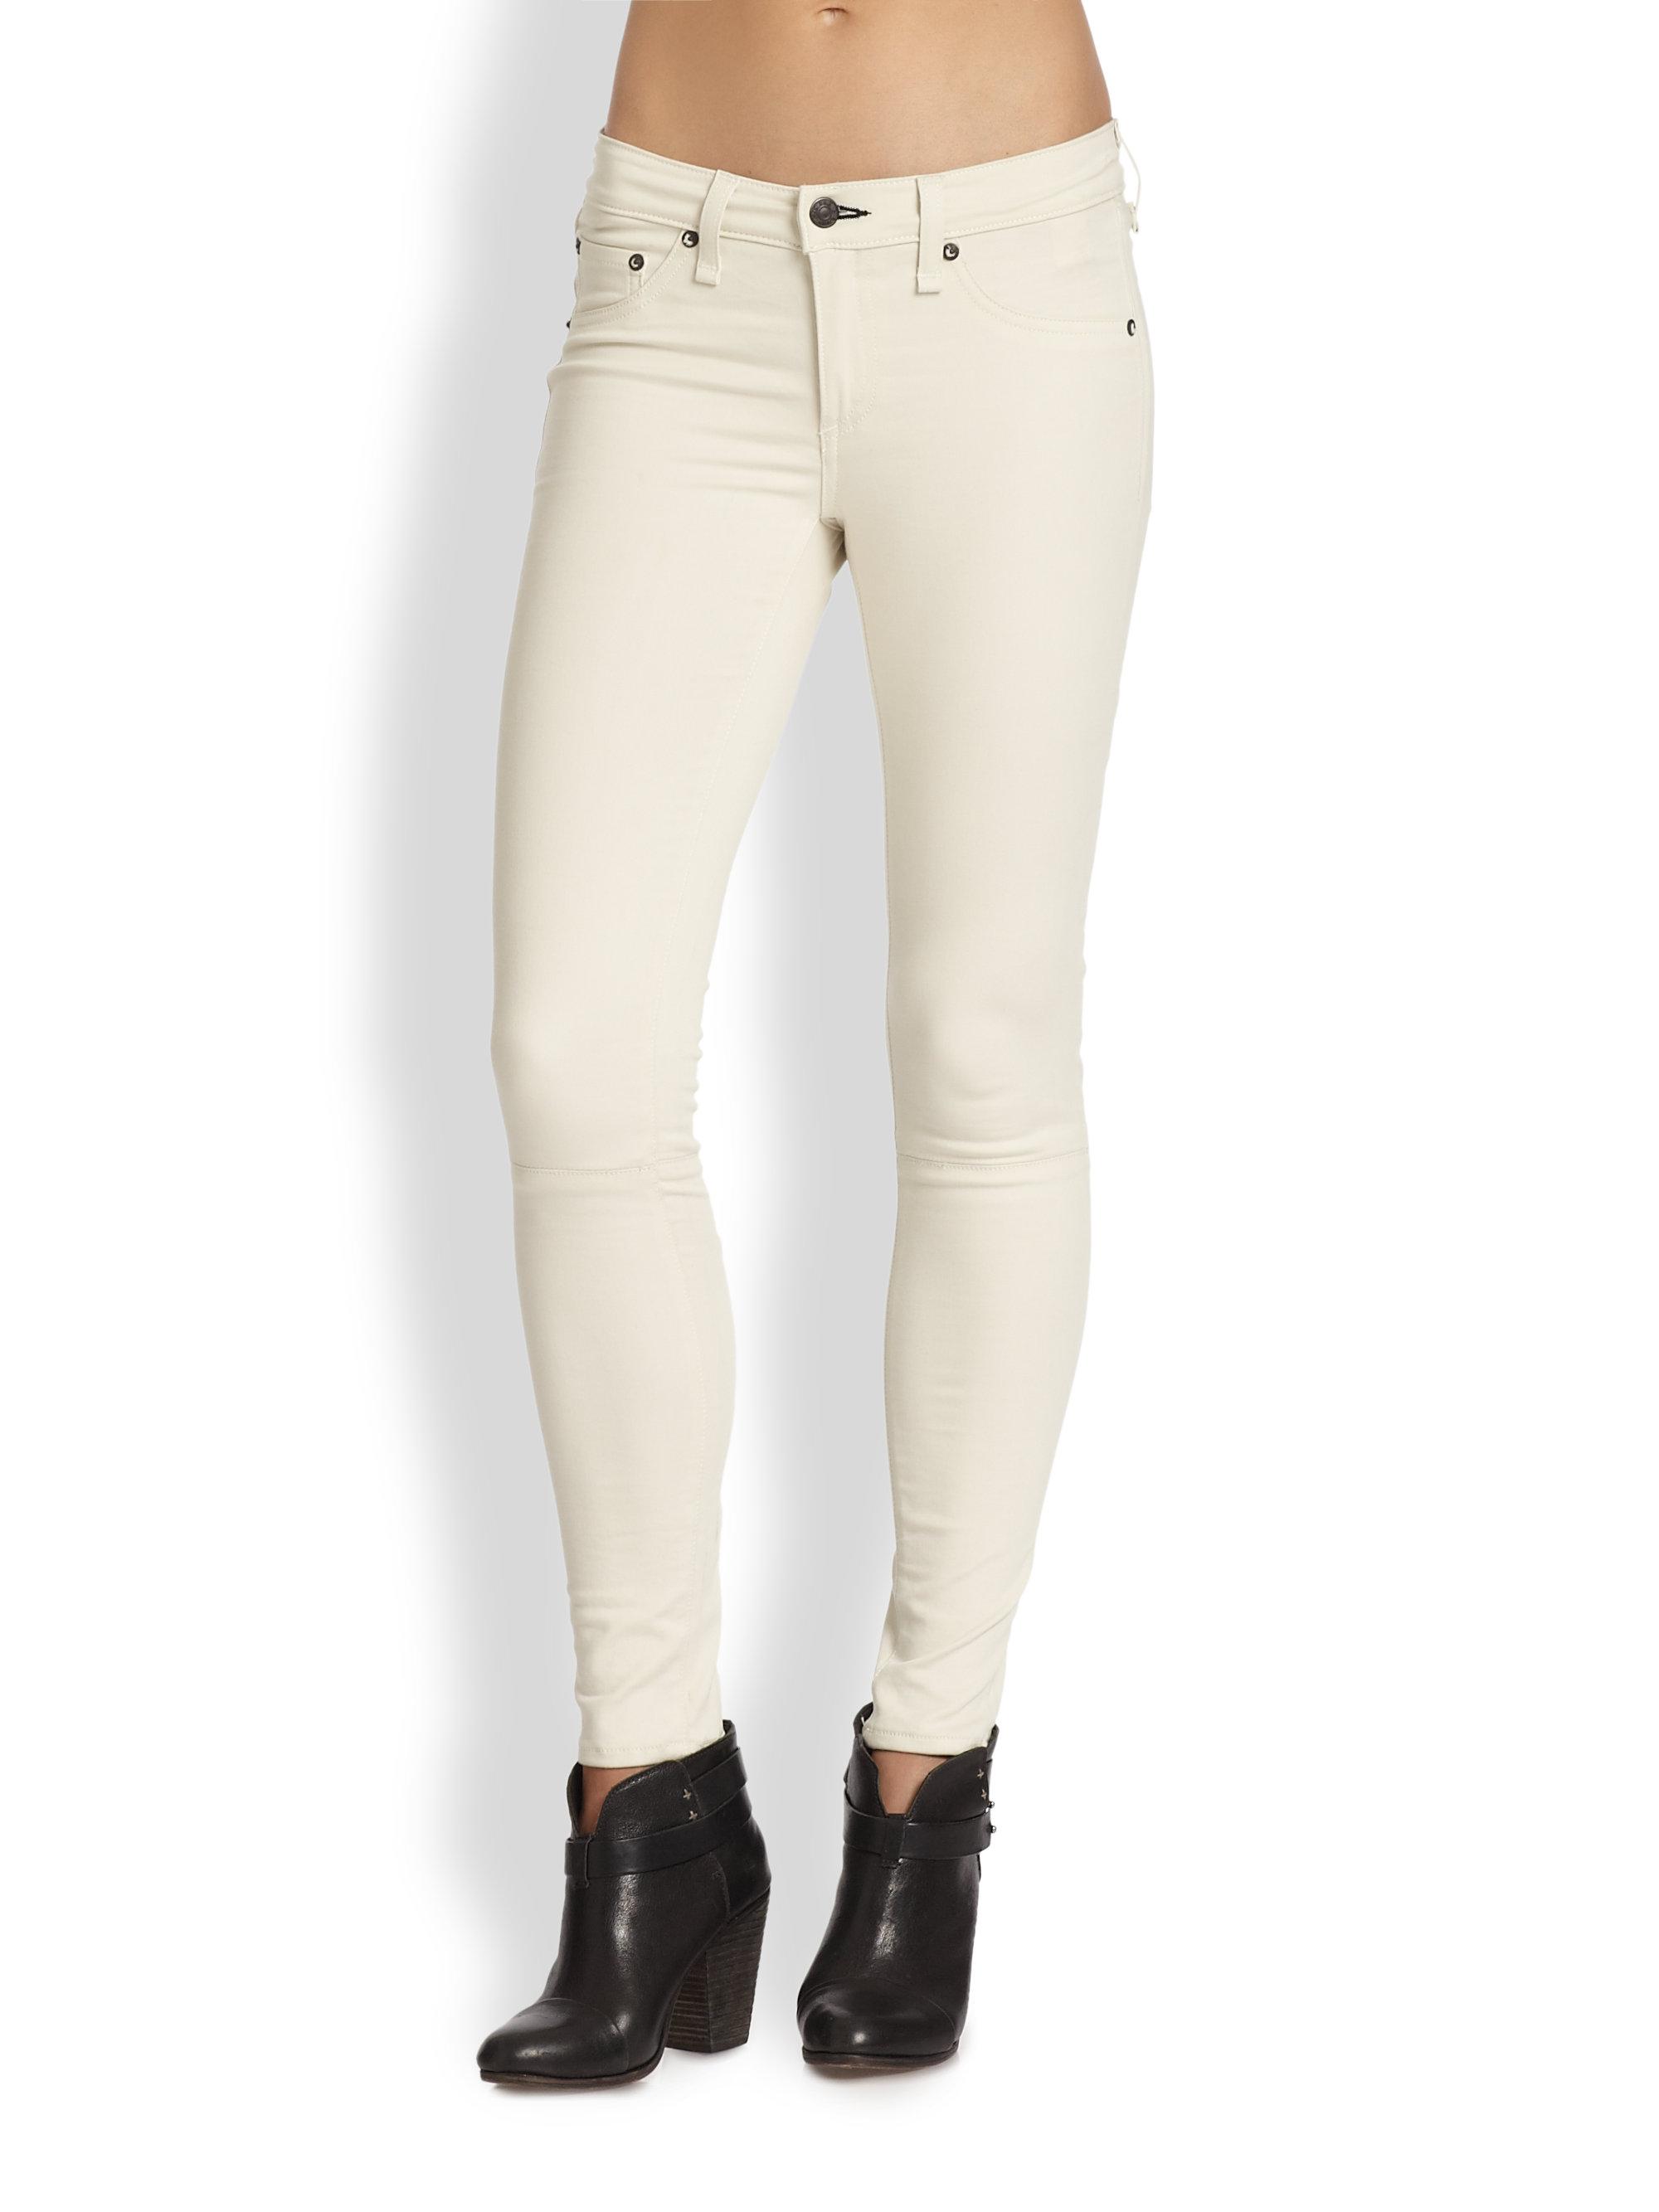 Rag &amp bone Devi Laceup Skinny Jeans in White | Lyst